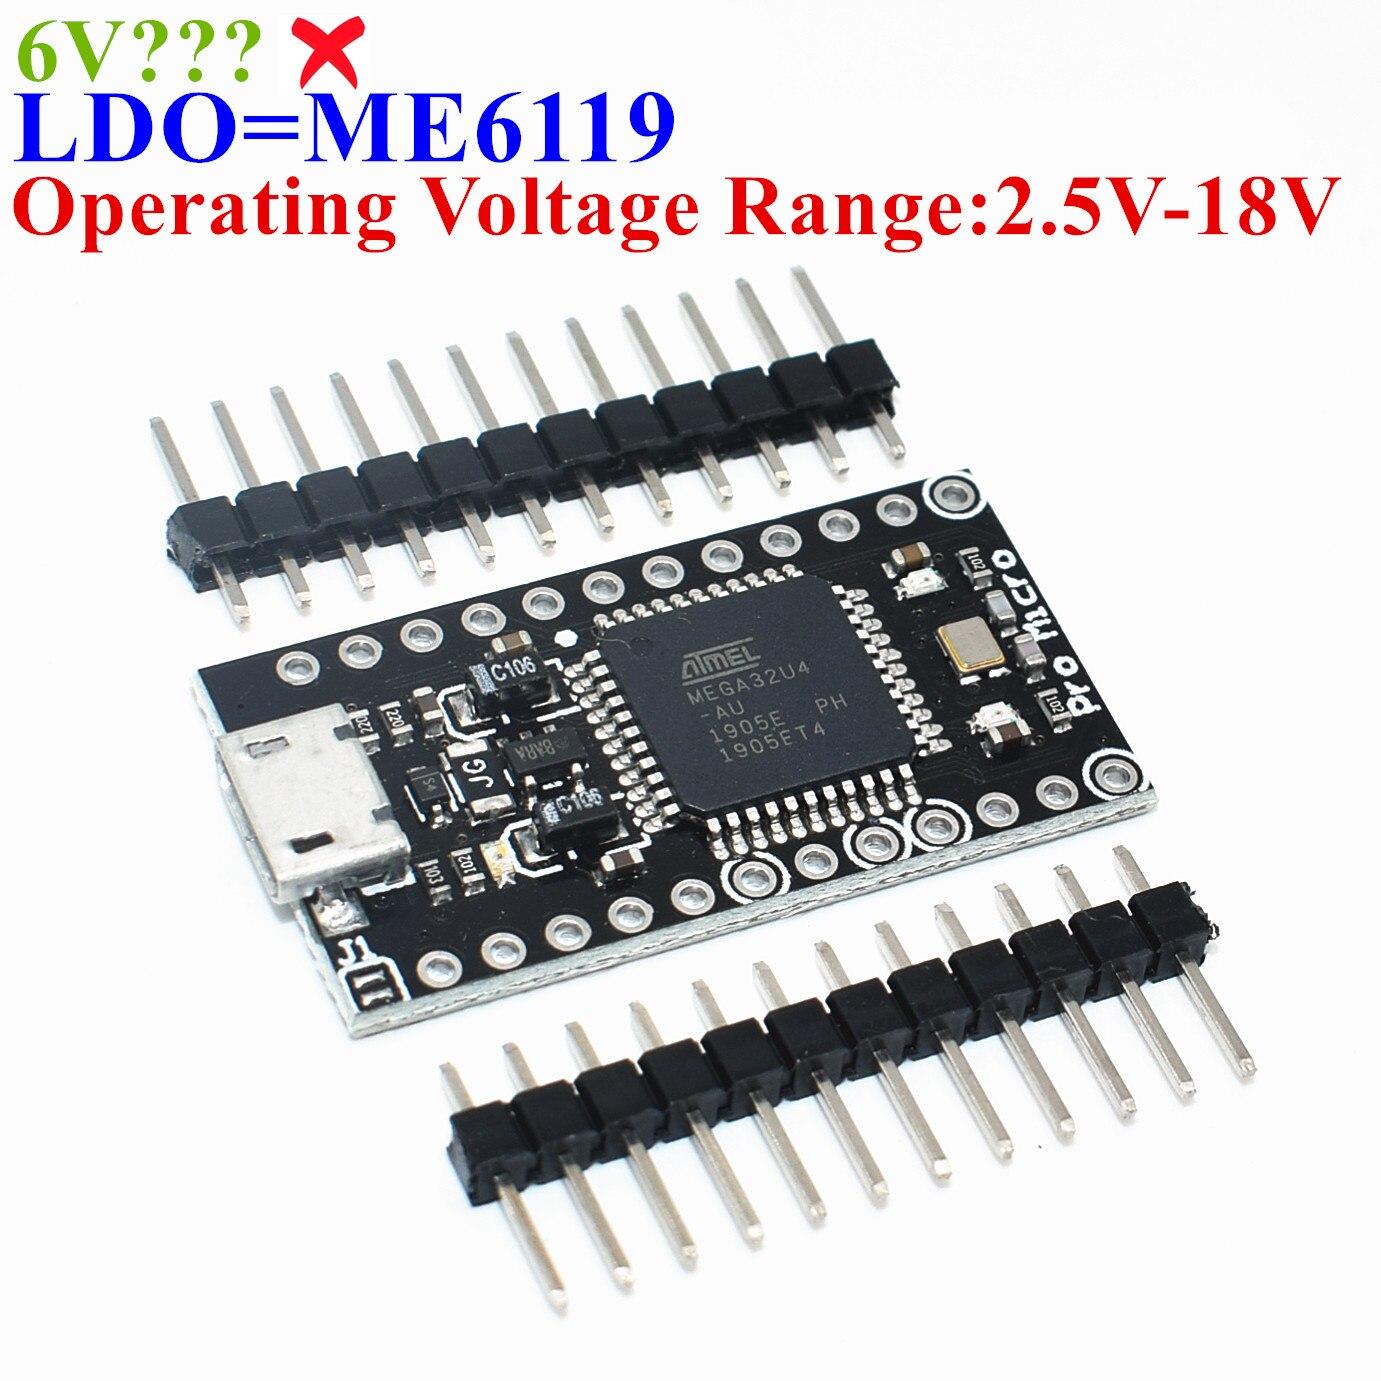 1pcs TENSTAR ROBOT With the bootloader Black Pro Micro ATmega32U4 5V/16MHz Module controller Mega32U4 leonardo for arduino Пенал